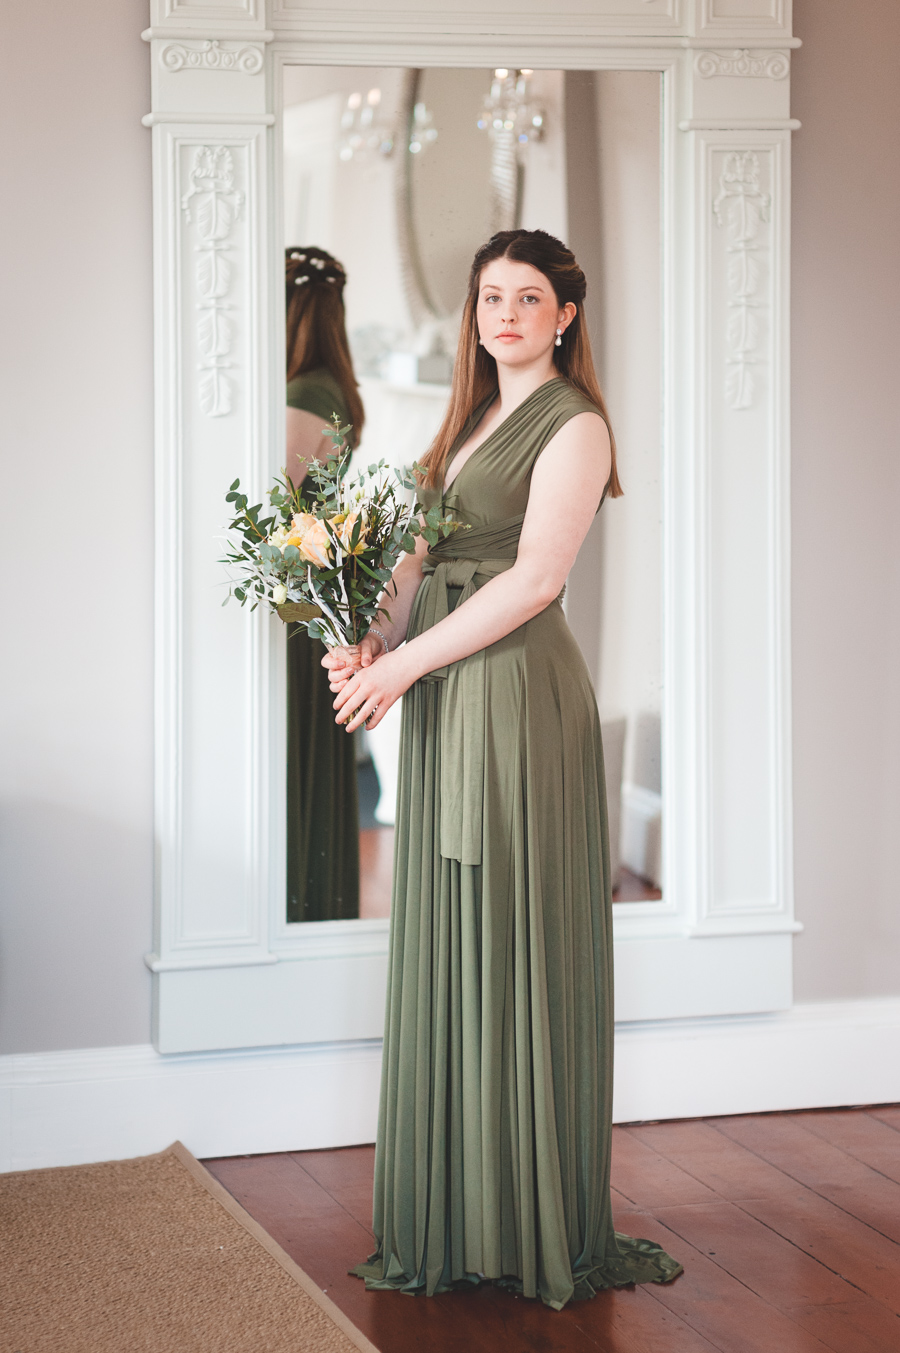 Yorkshire wedding venue styling ideas, photo credit Boho Chic Weddings (29)